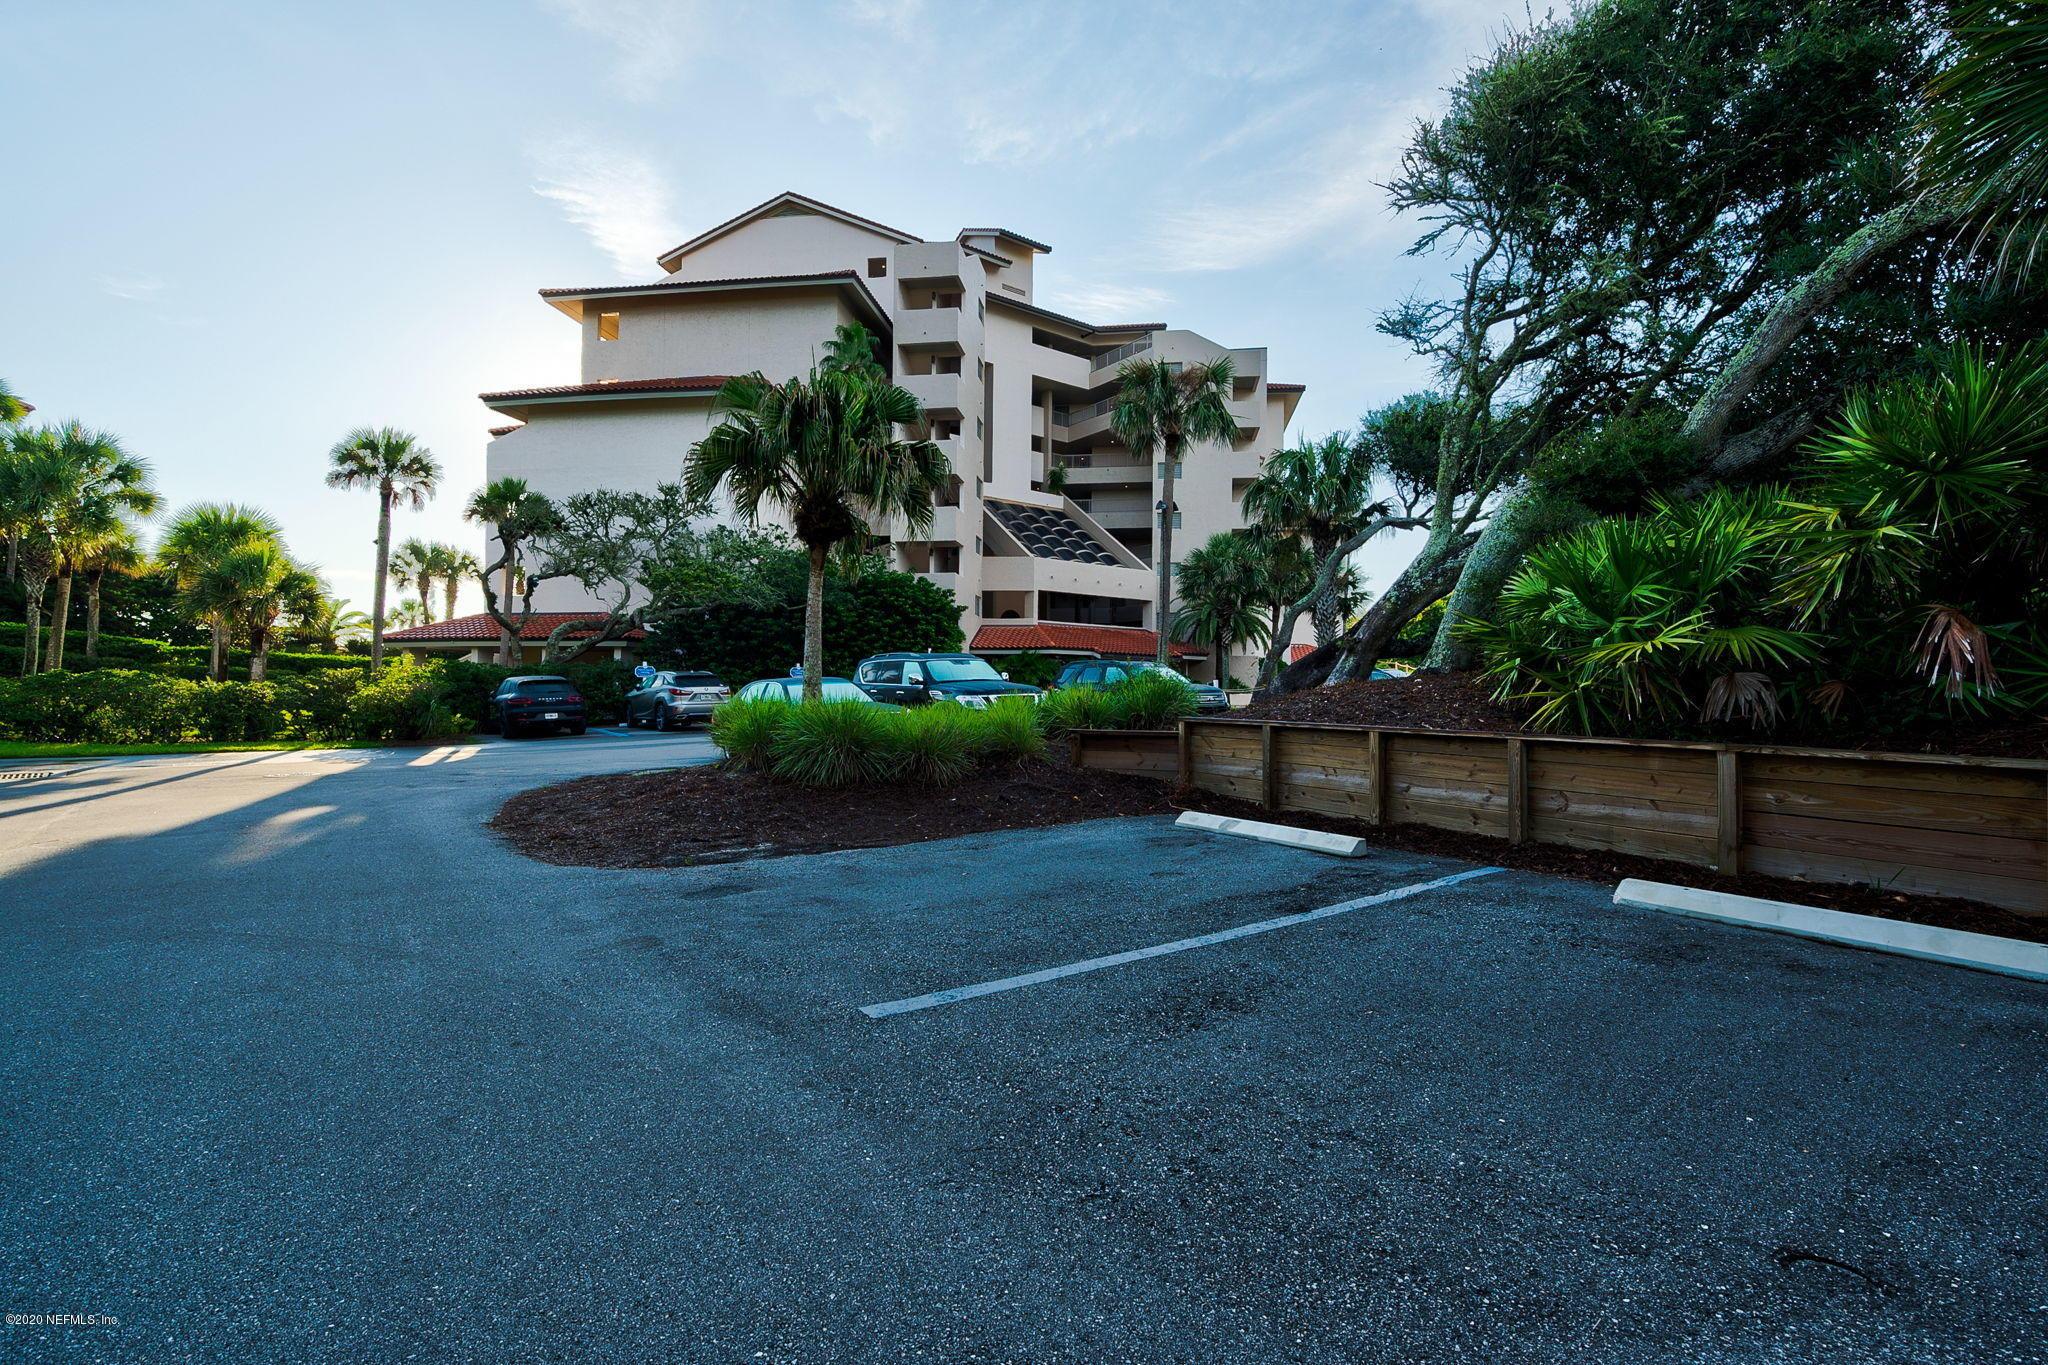 236 SANDCASTLES, FERNANDINA BEACH, FLORIDA 32034, 1 Bedroom Bedrooms, ,1 BathroomBathrooms,Residential,For sale,SANDCASTLES,1069600